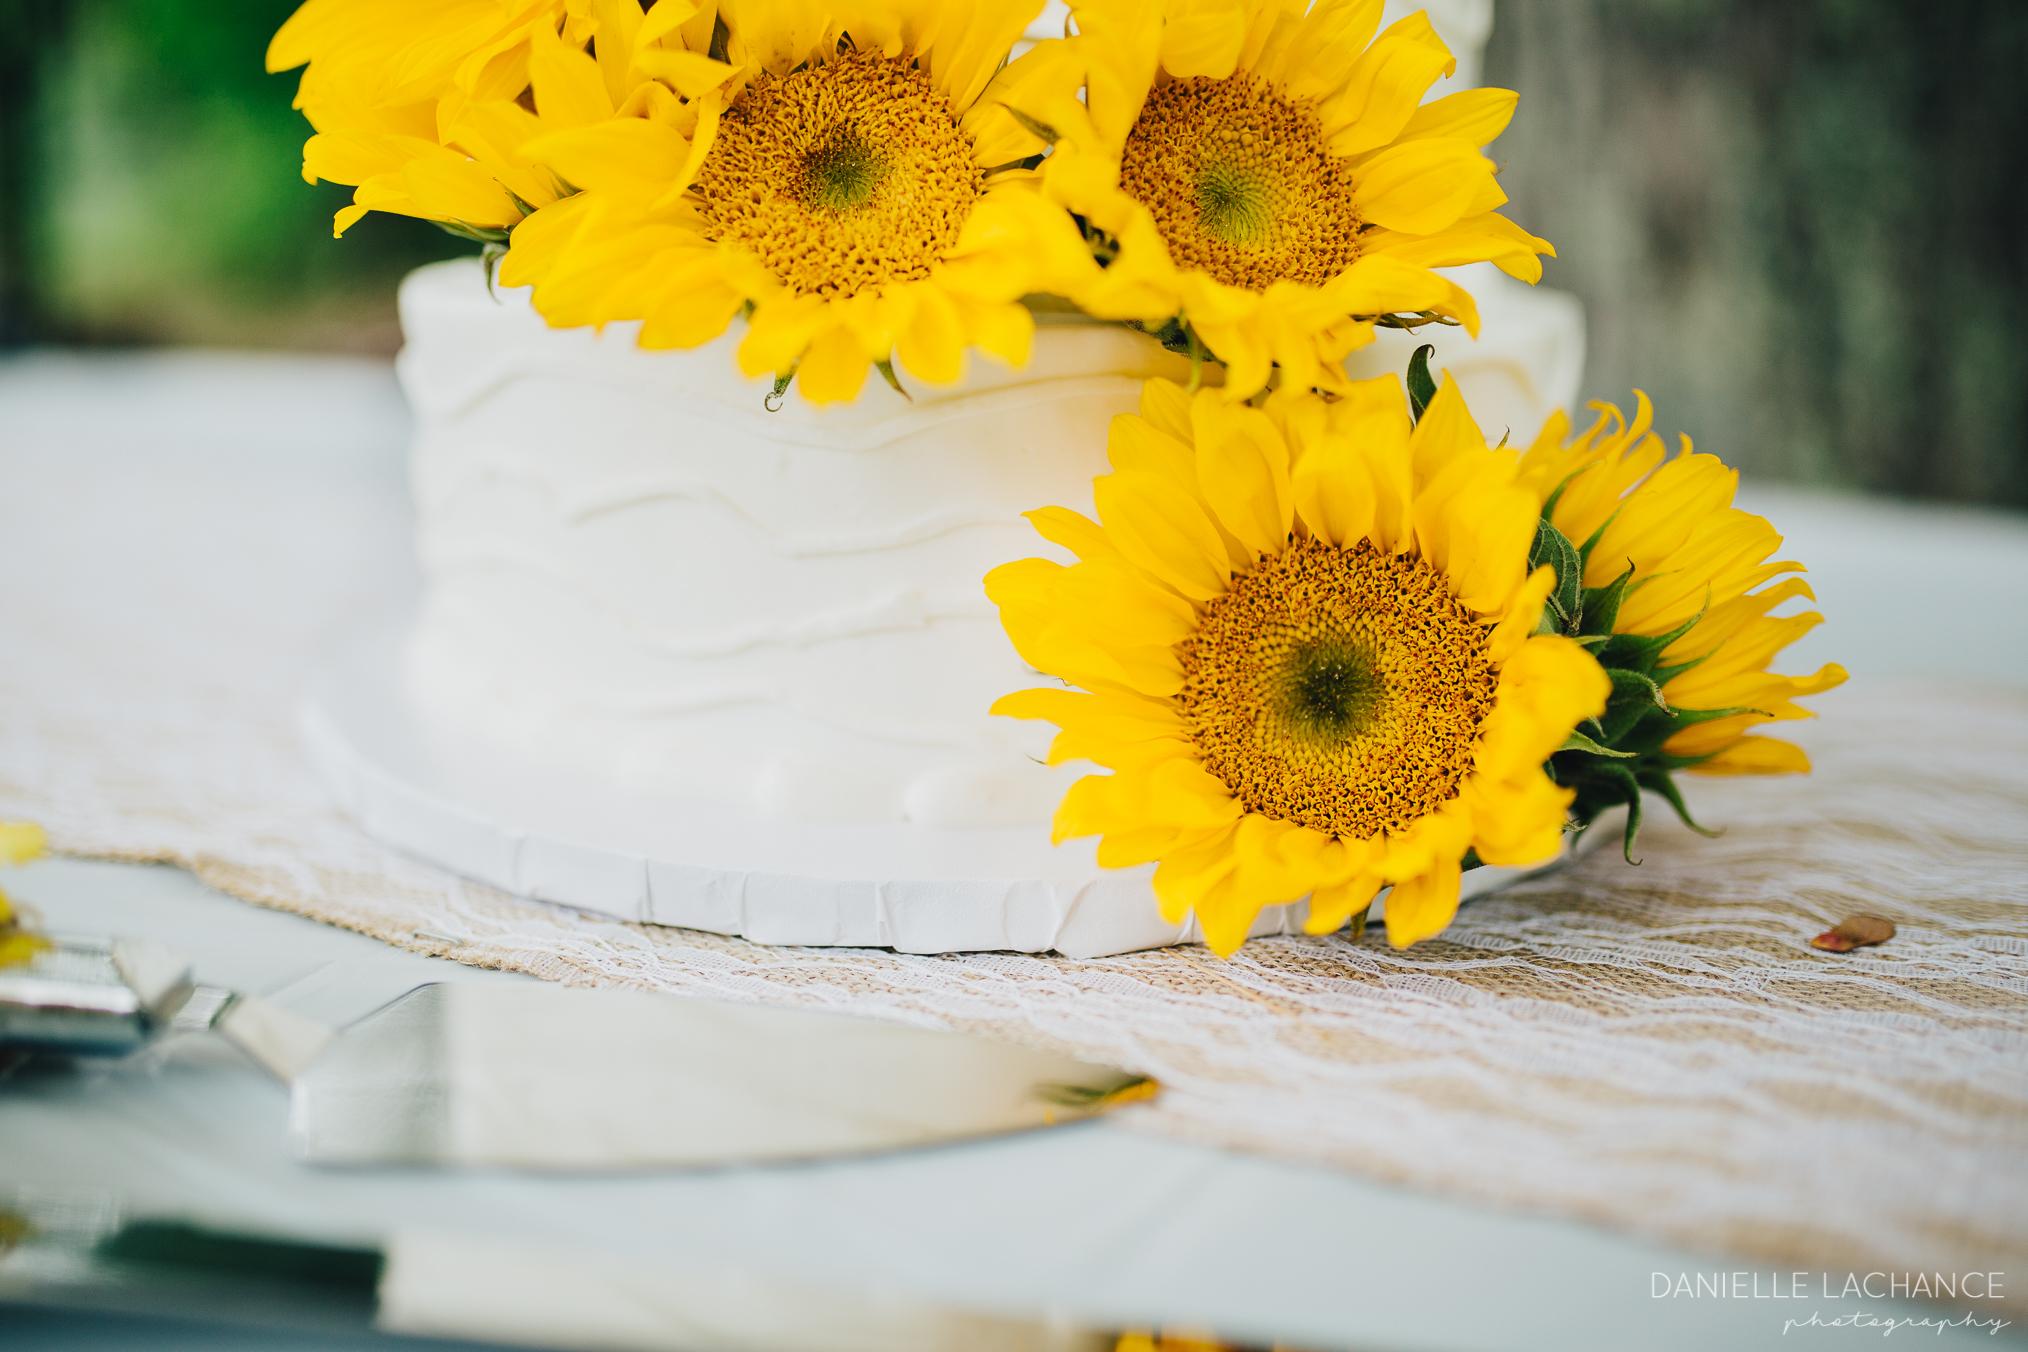 maine-new-england-new-hampshire-wedding-photographer-outdoor-backyard-rustic-elopement-wedding-photography-10.jpg